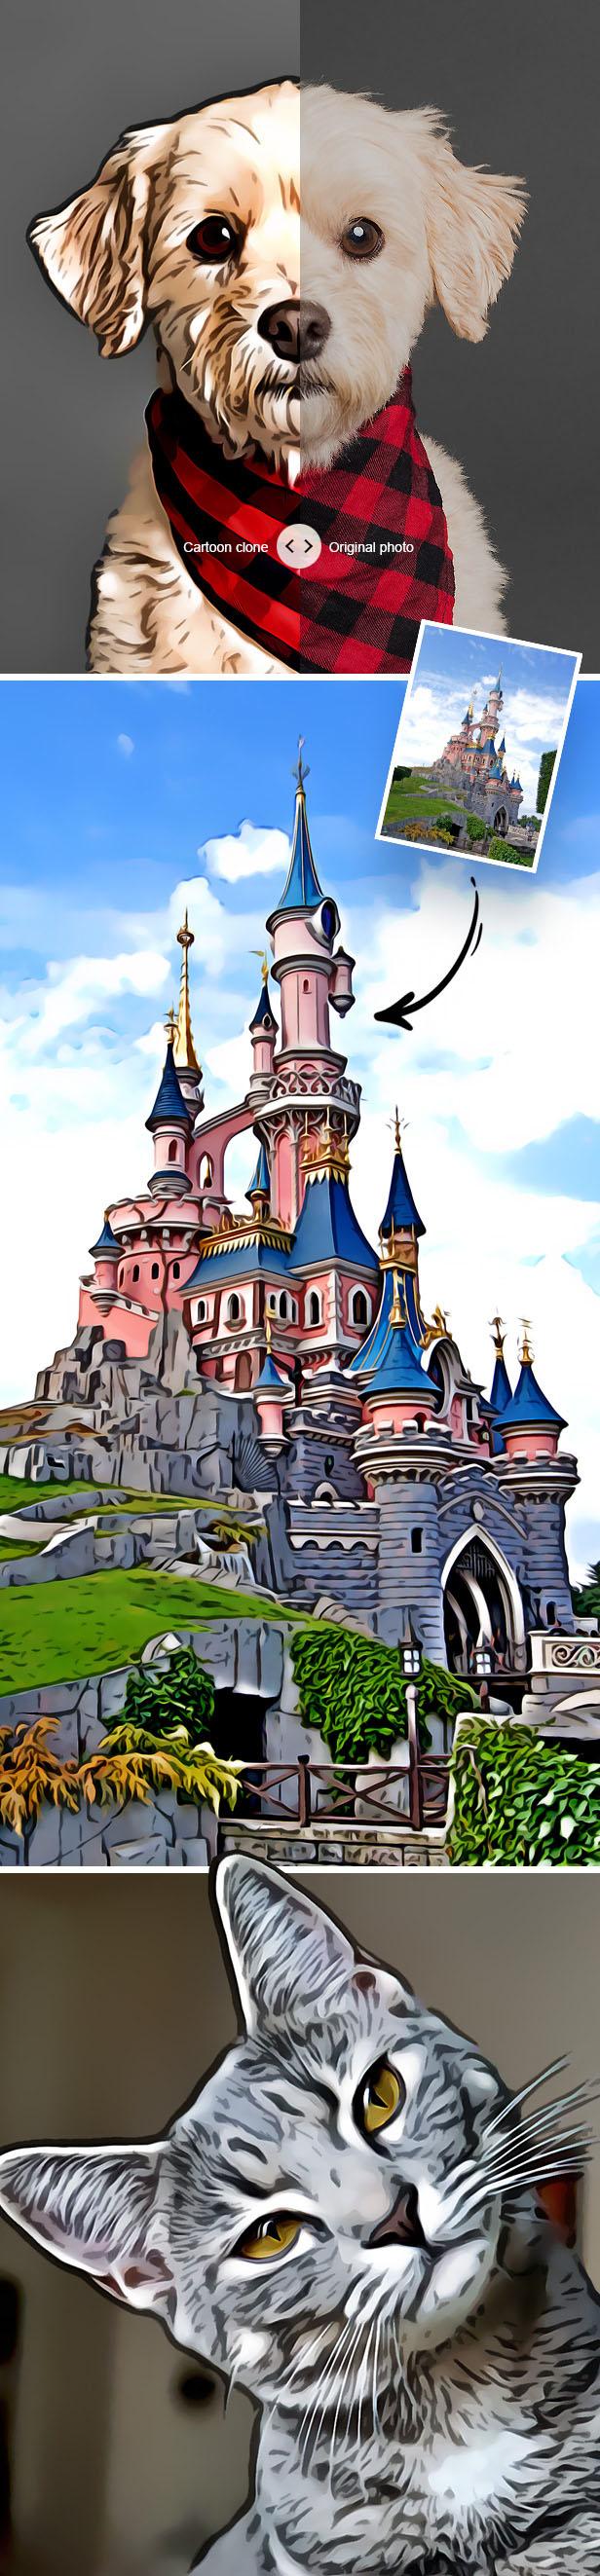 Cartoon Maker - Clone - Photoshop Plugin - 20